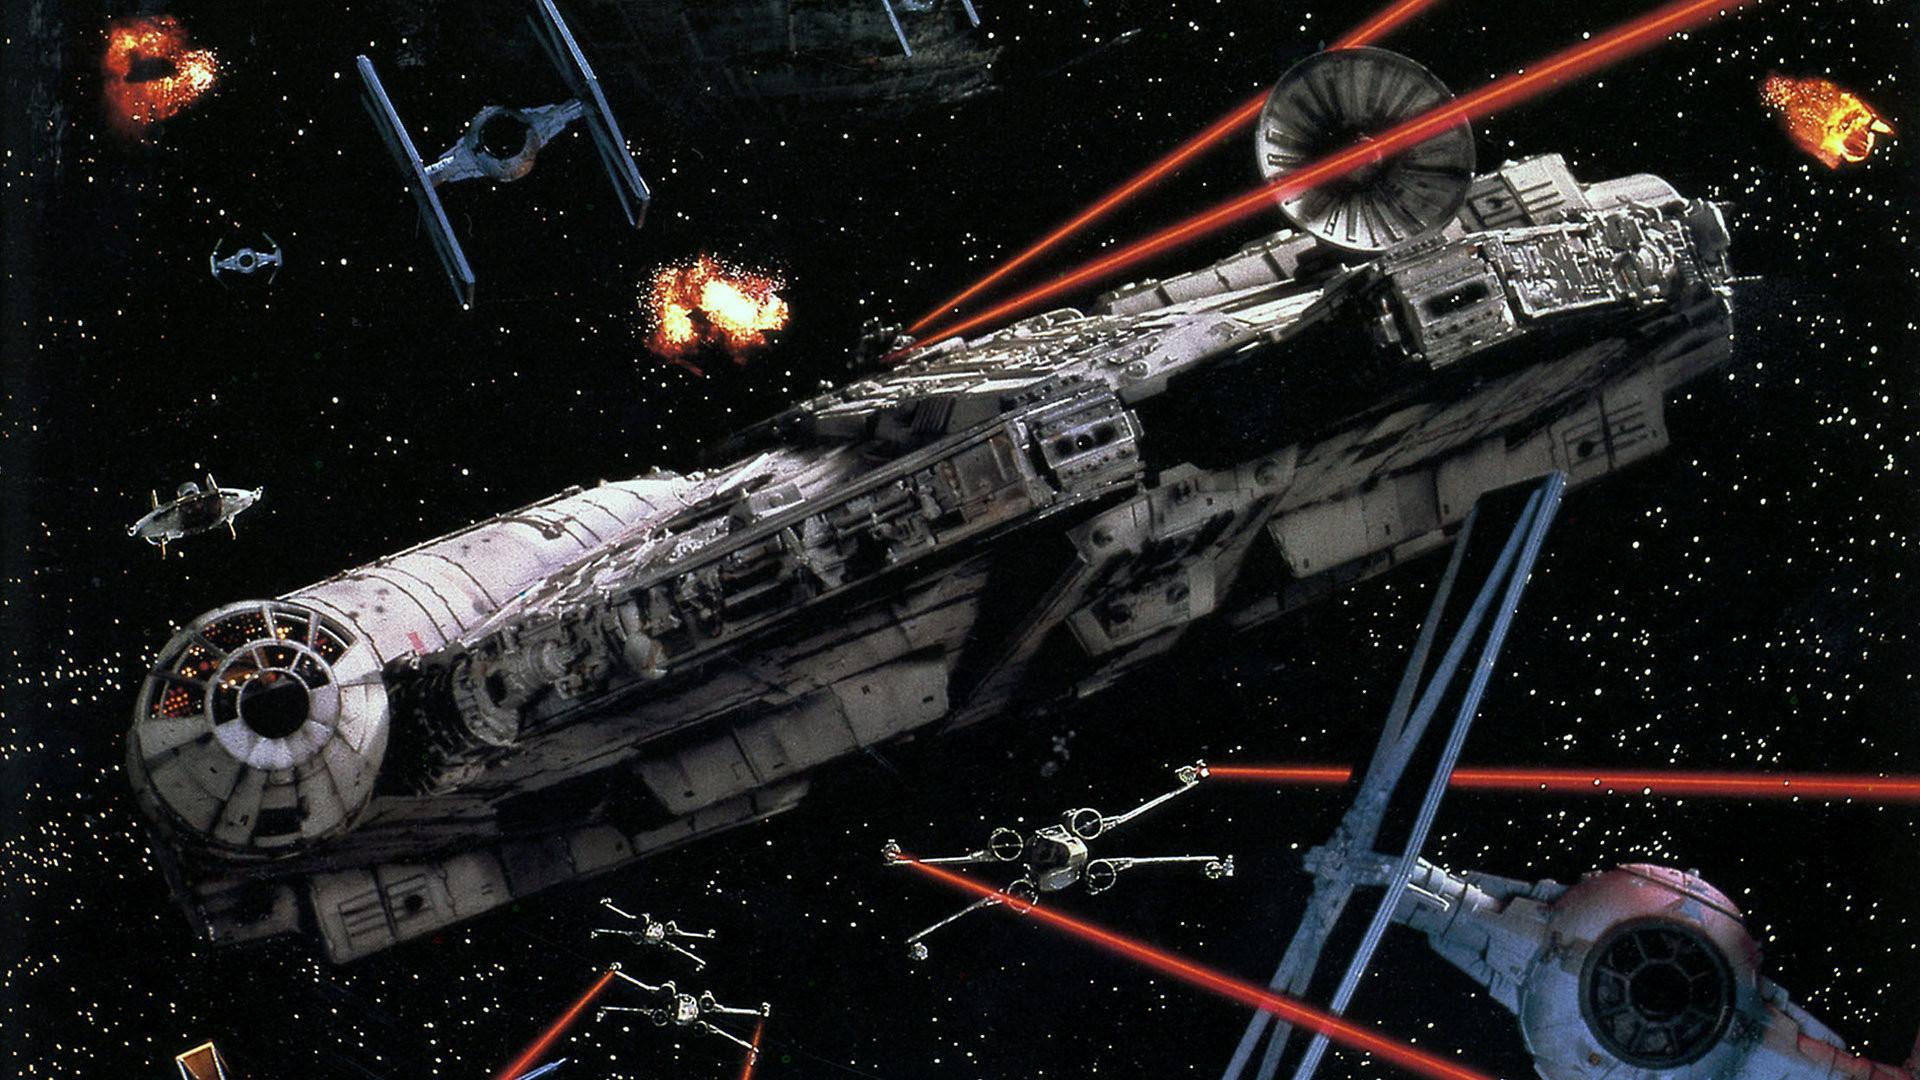 Star Wars Widescreen Wallpaper 72 Images